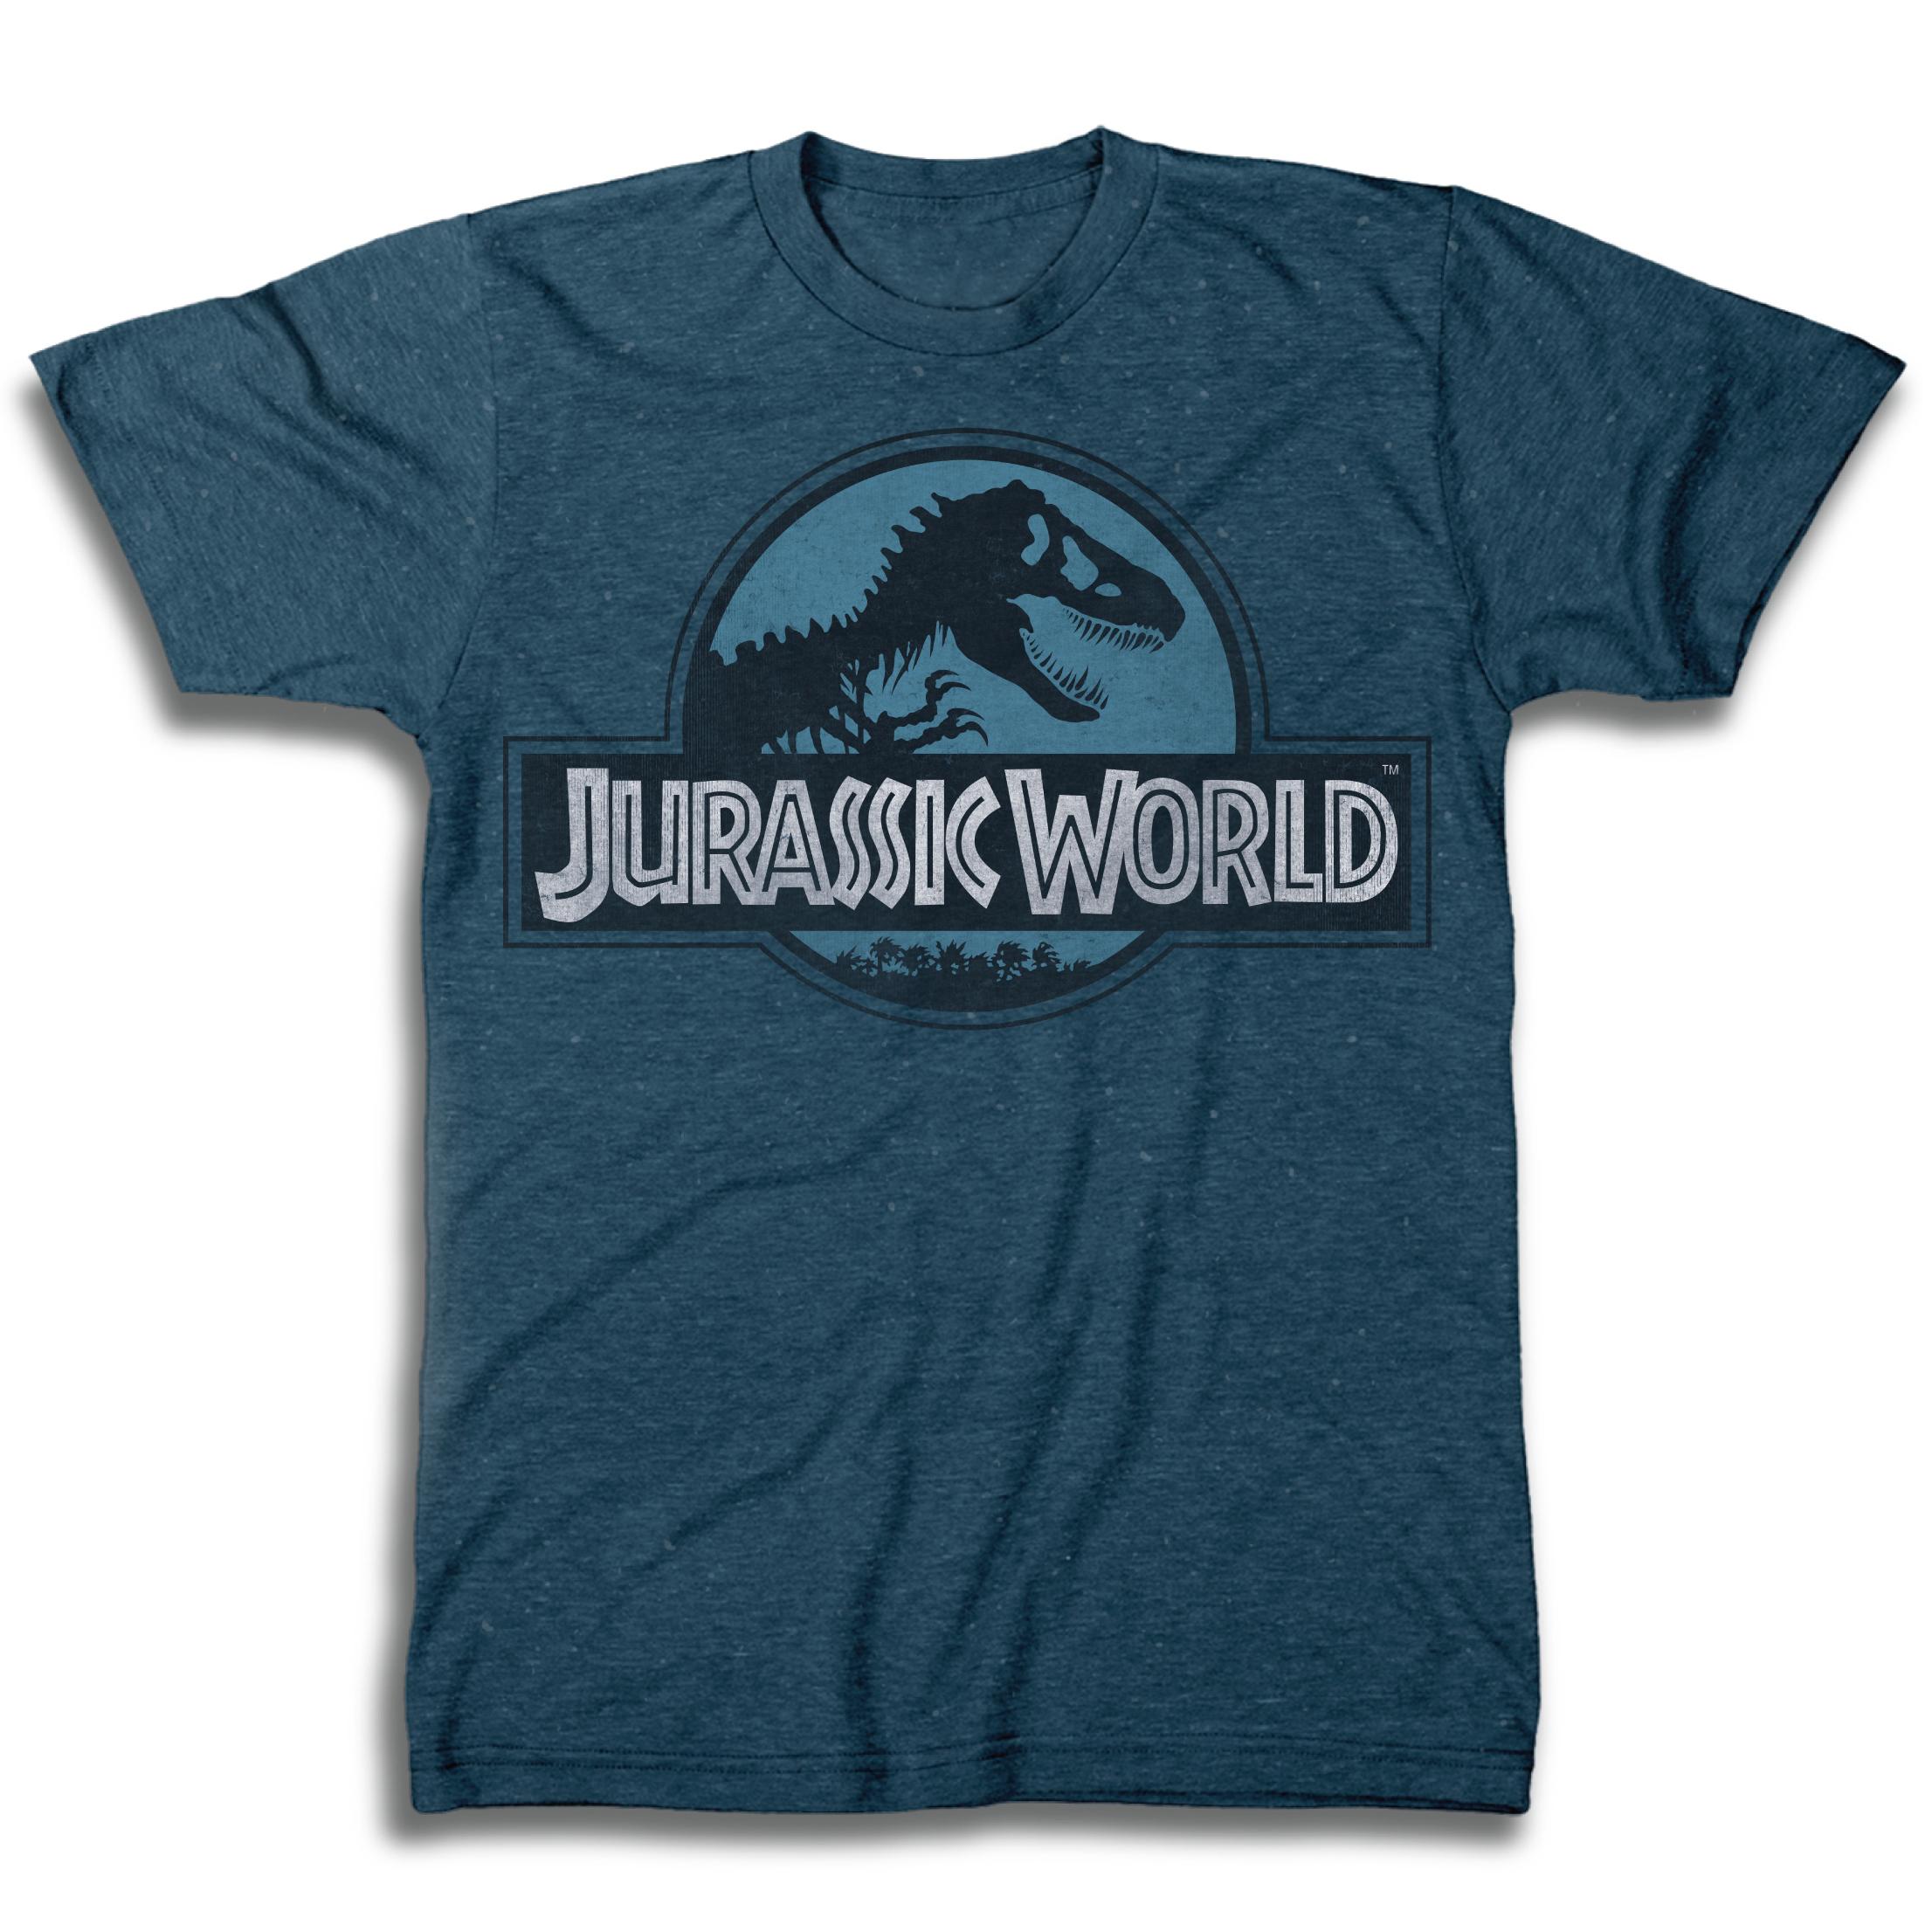 e86bbb4a68 Jurassic World Logo Blue Short Sleeve Men s T-Shirt - TshirtMall.com ...